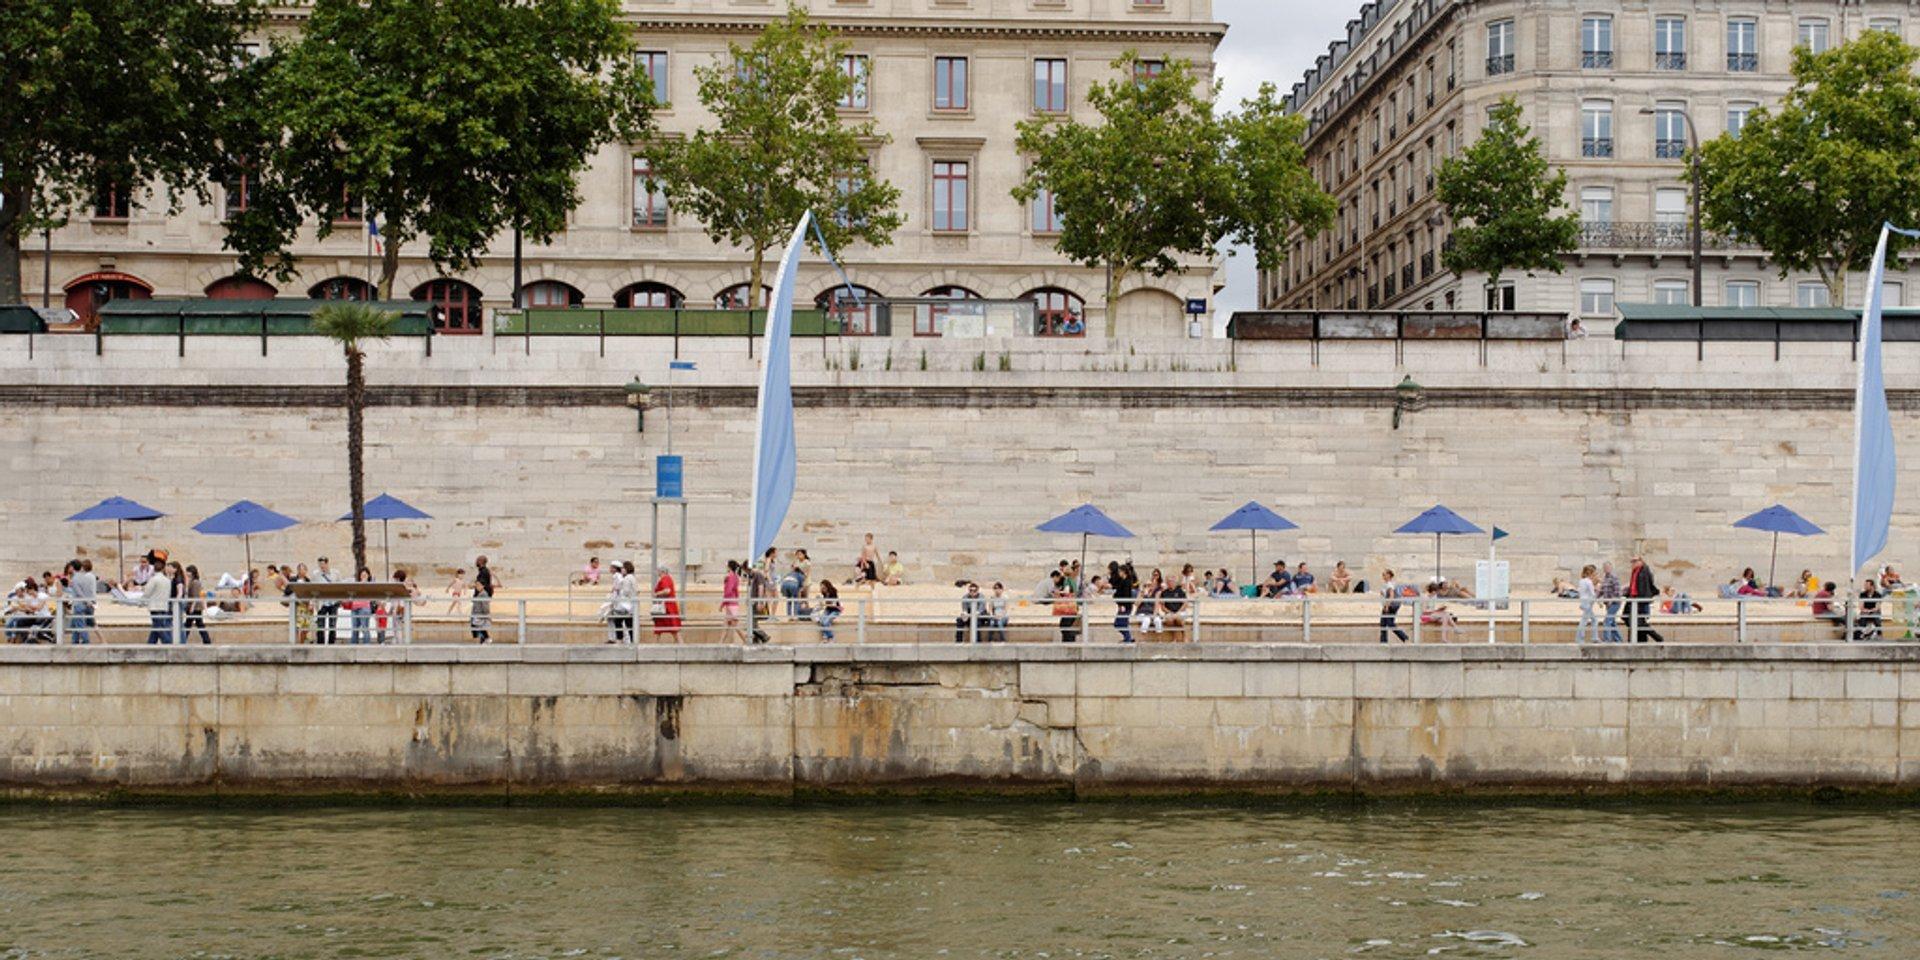 Beaches on the Seine or Paris Plages in Paris - Best Season 2020